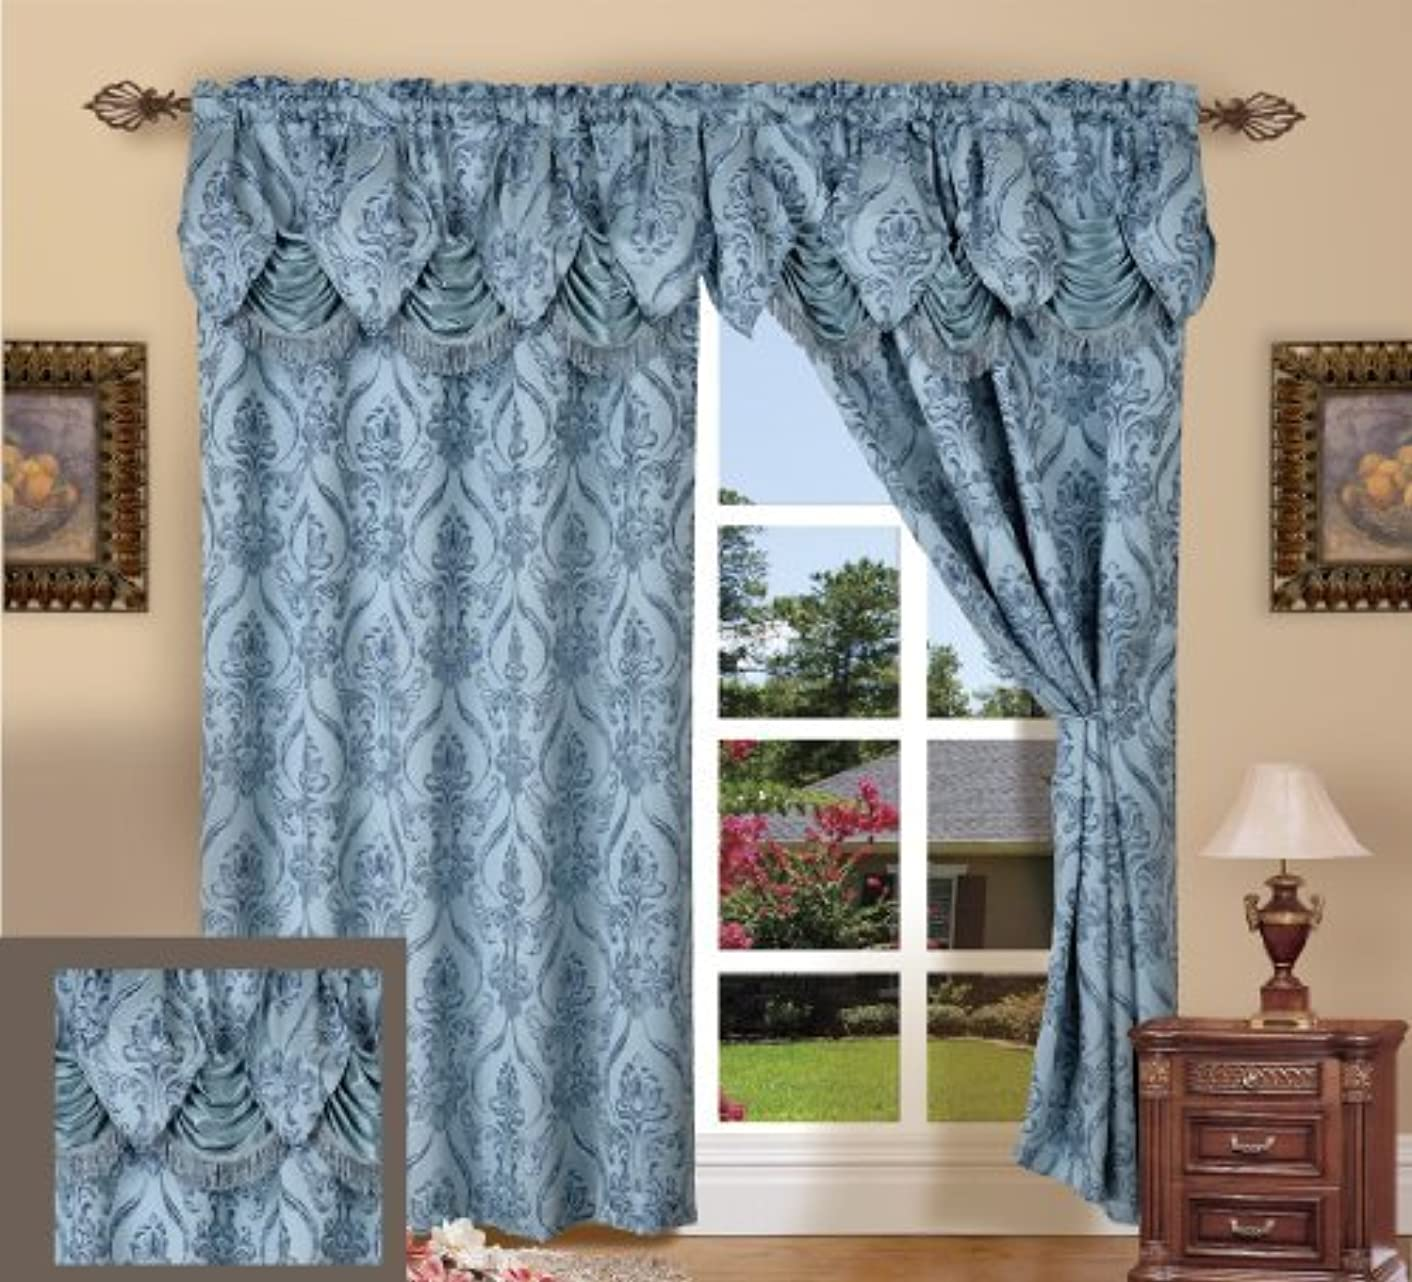 Elegance Linen Beautiful Design Jacquard Look Curtain Panels 55